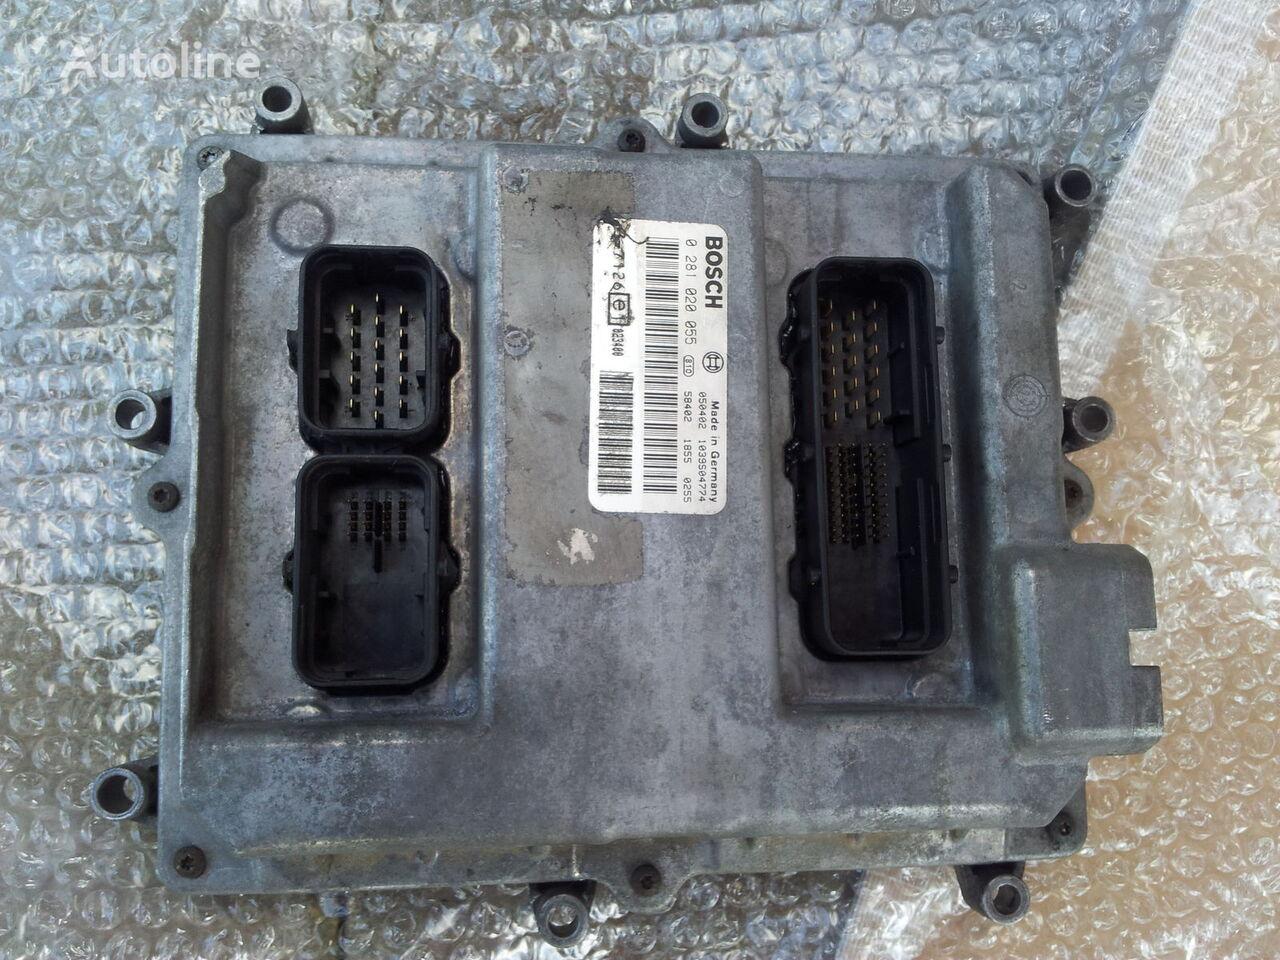 MAN Common Rail EDC, ECU electronic diesel control 0281020055, D2066LF01, 51258037126, 51258337169, 51258037127, 51258337168 centralina para MAN TGA camião tractor